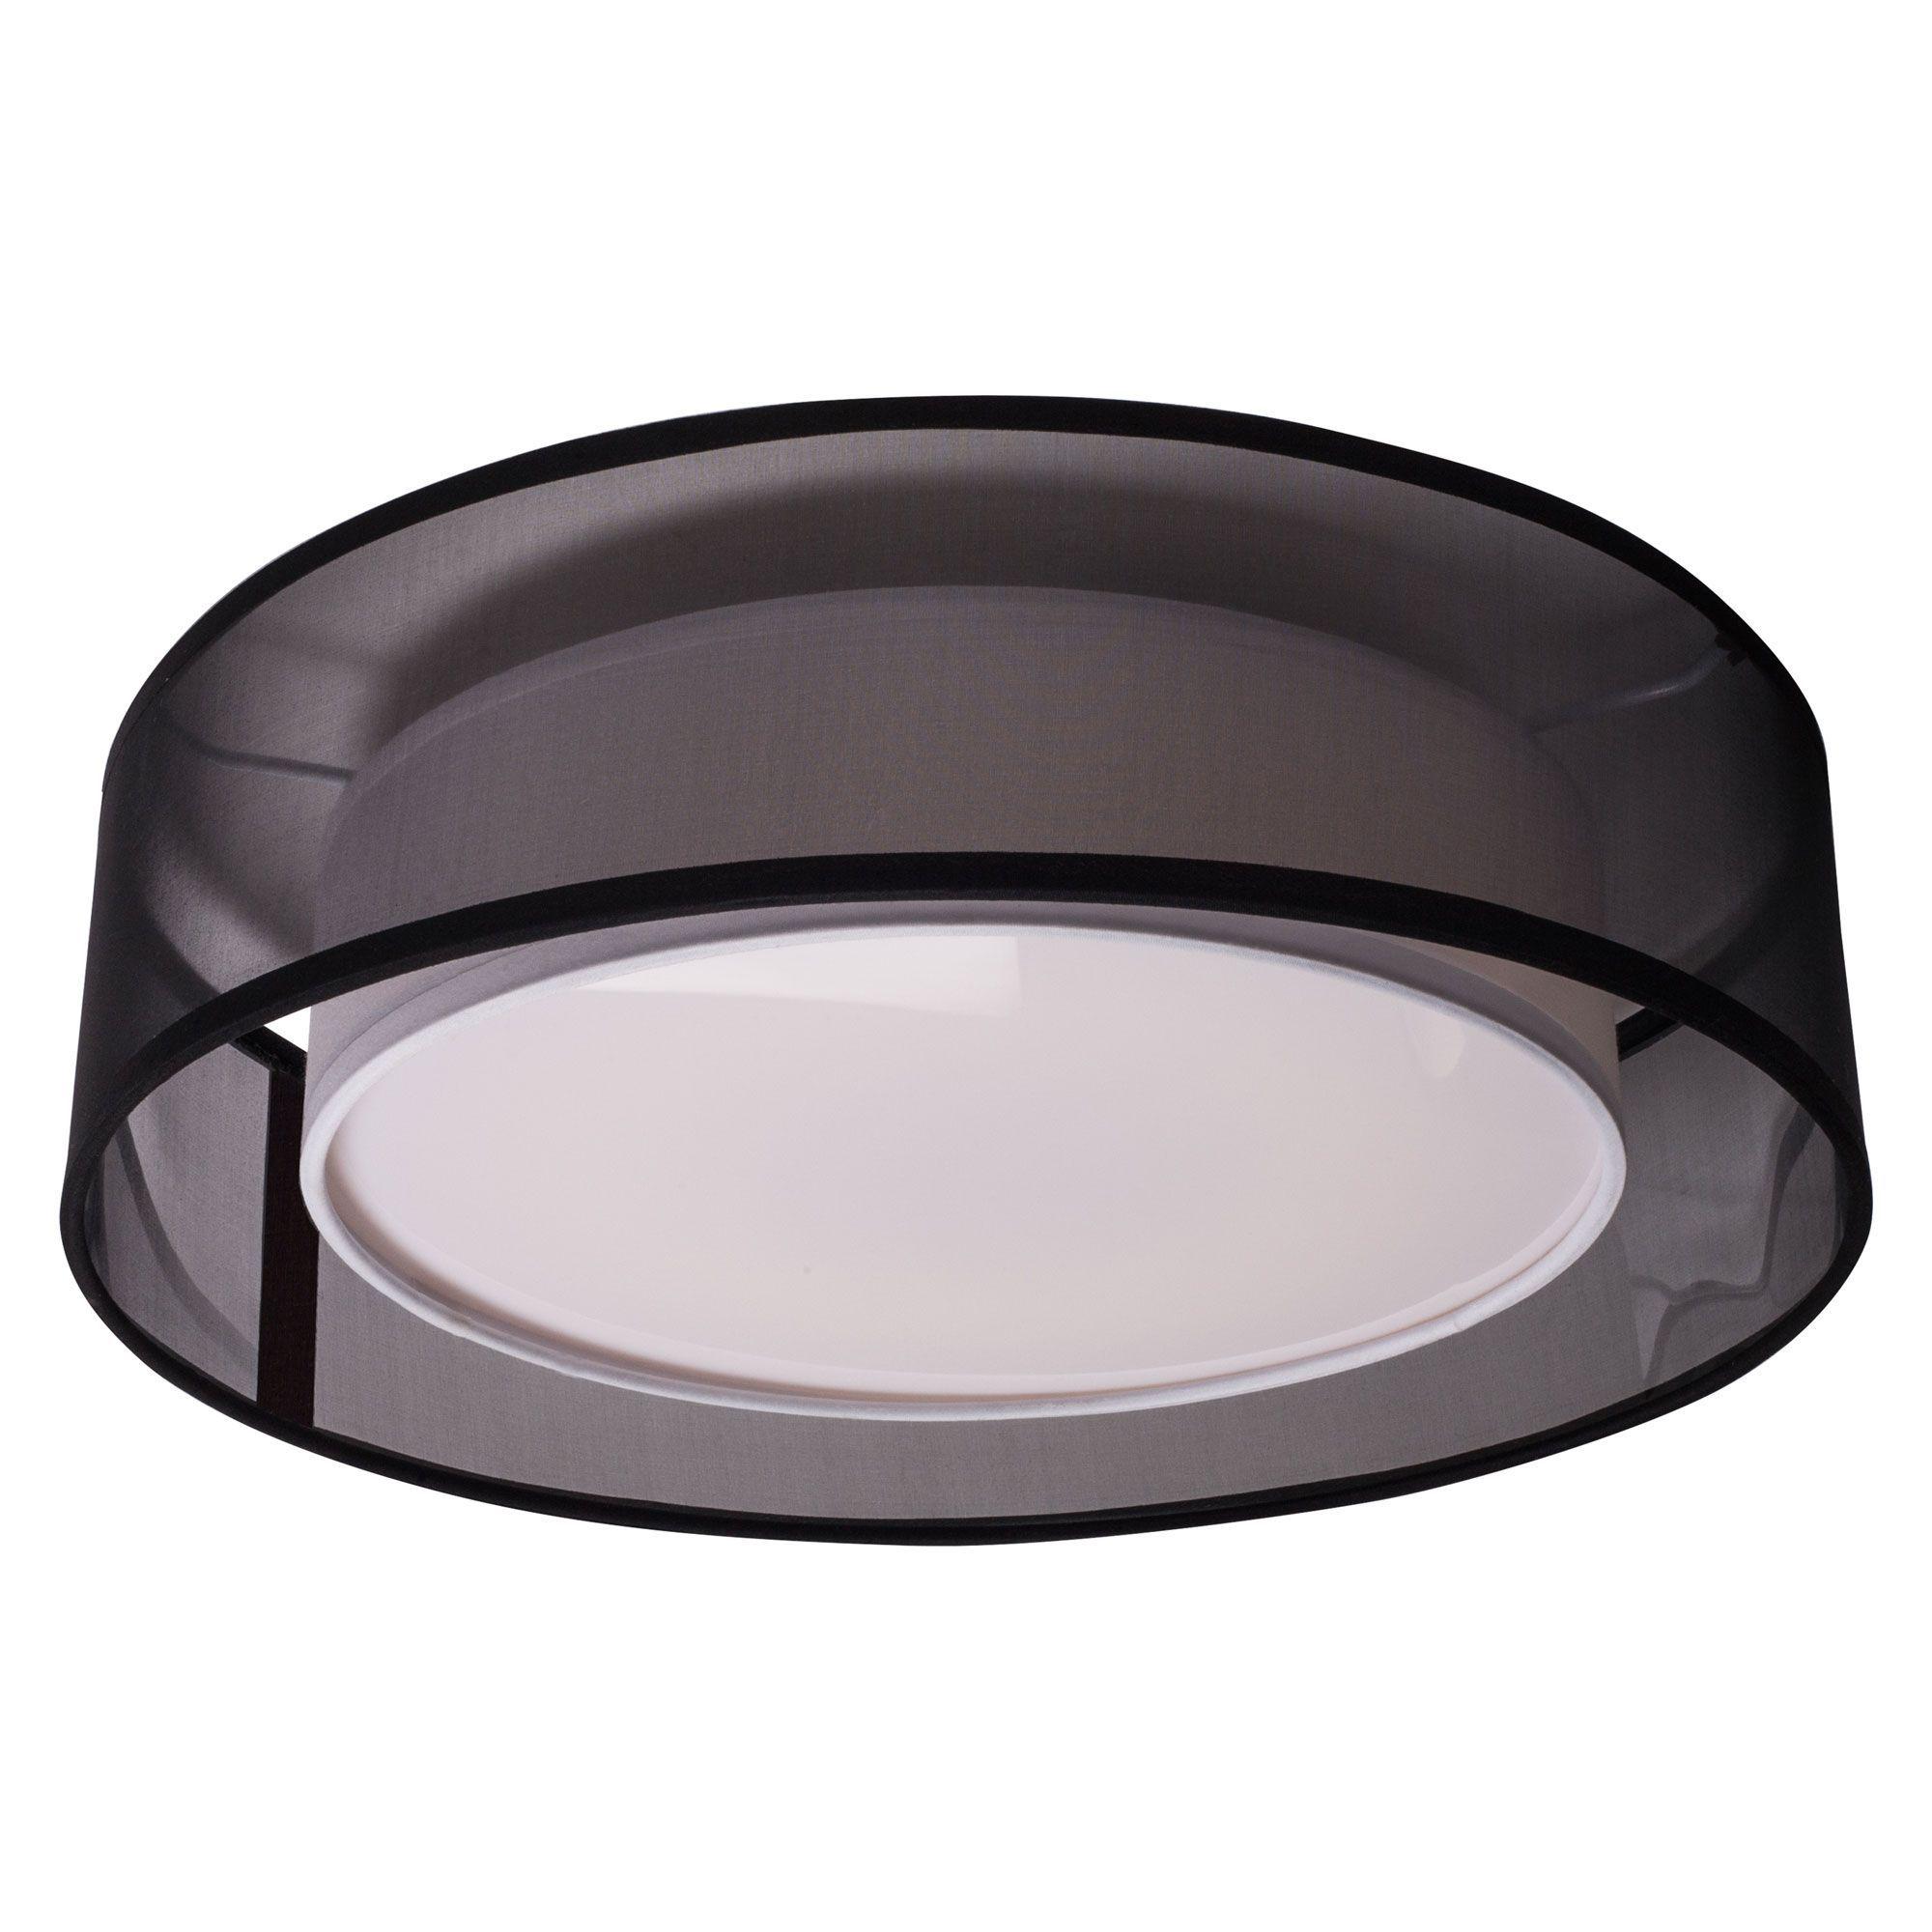 Covina Round Ceiling Light Fixture By Kuzco Lighting Fm11415 Bk